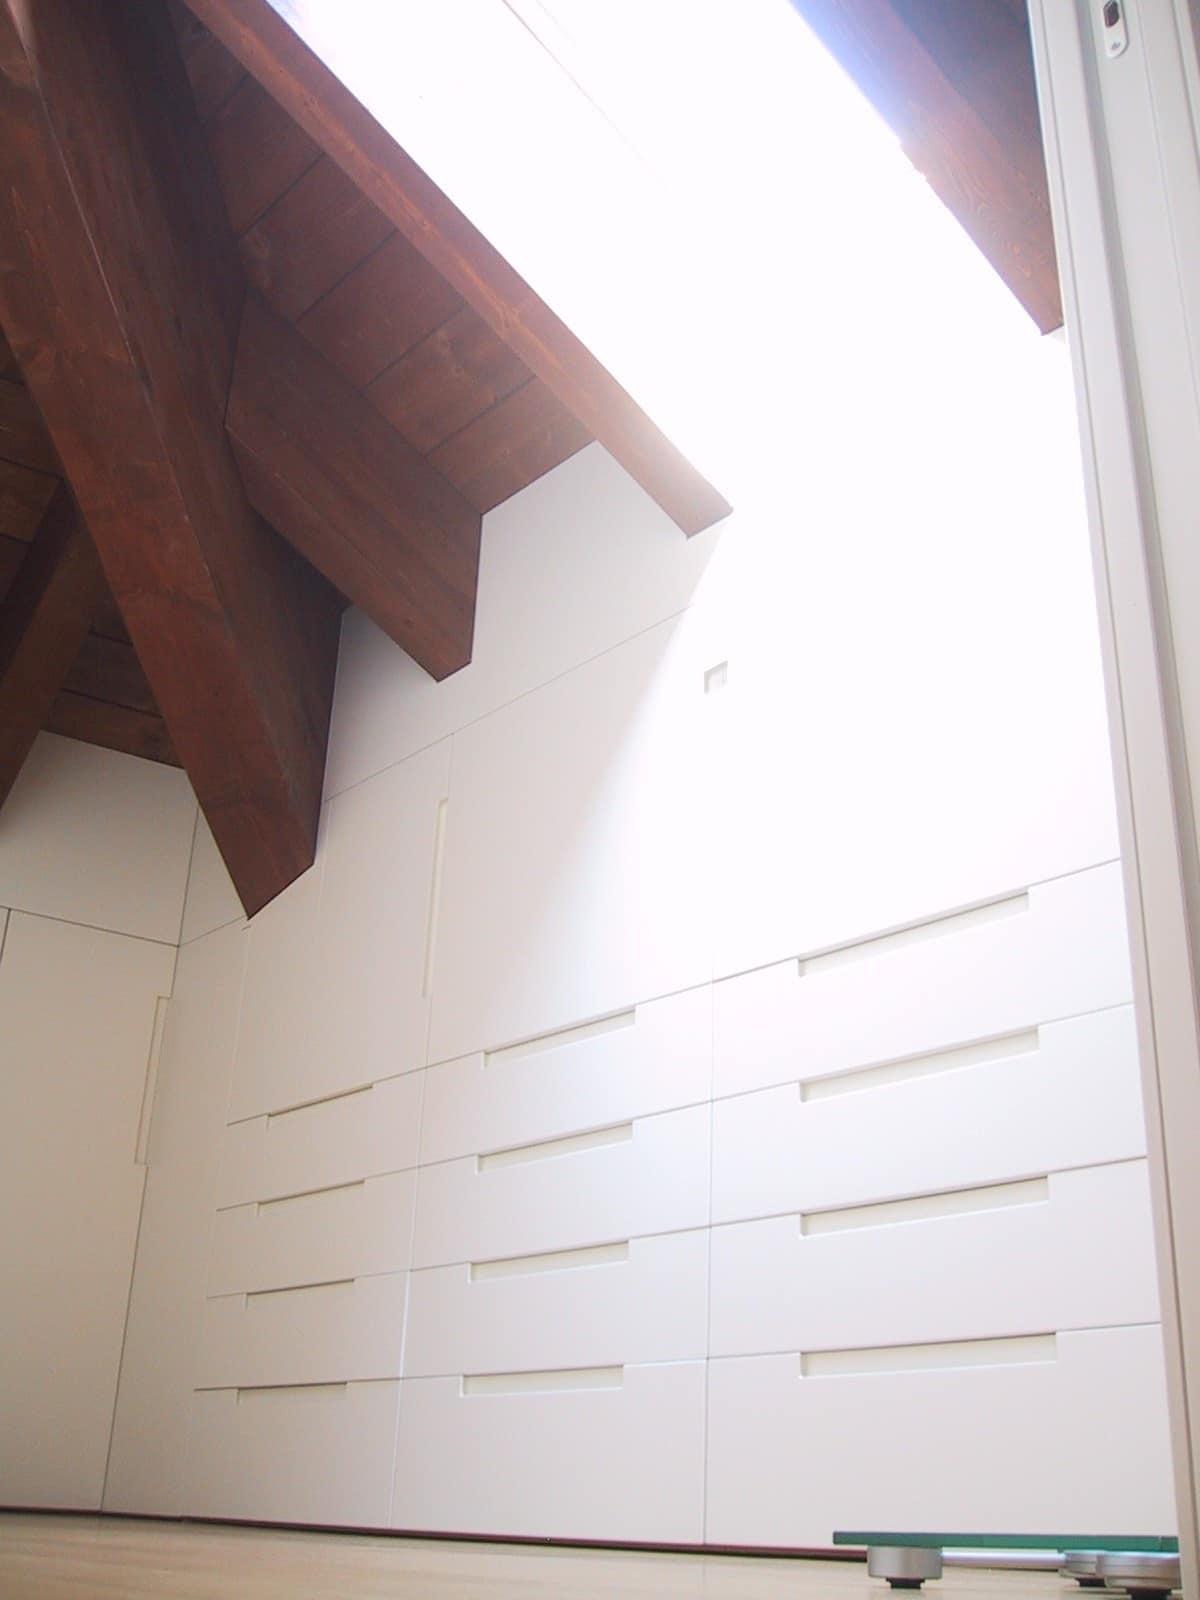 Armadi per mansarde 04, Armadio in legno laccato bianco, per mansarda